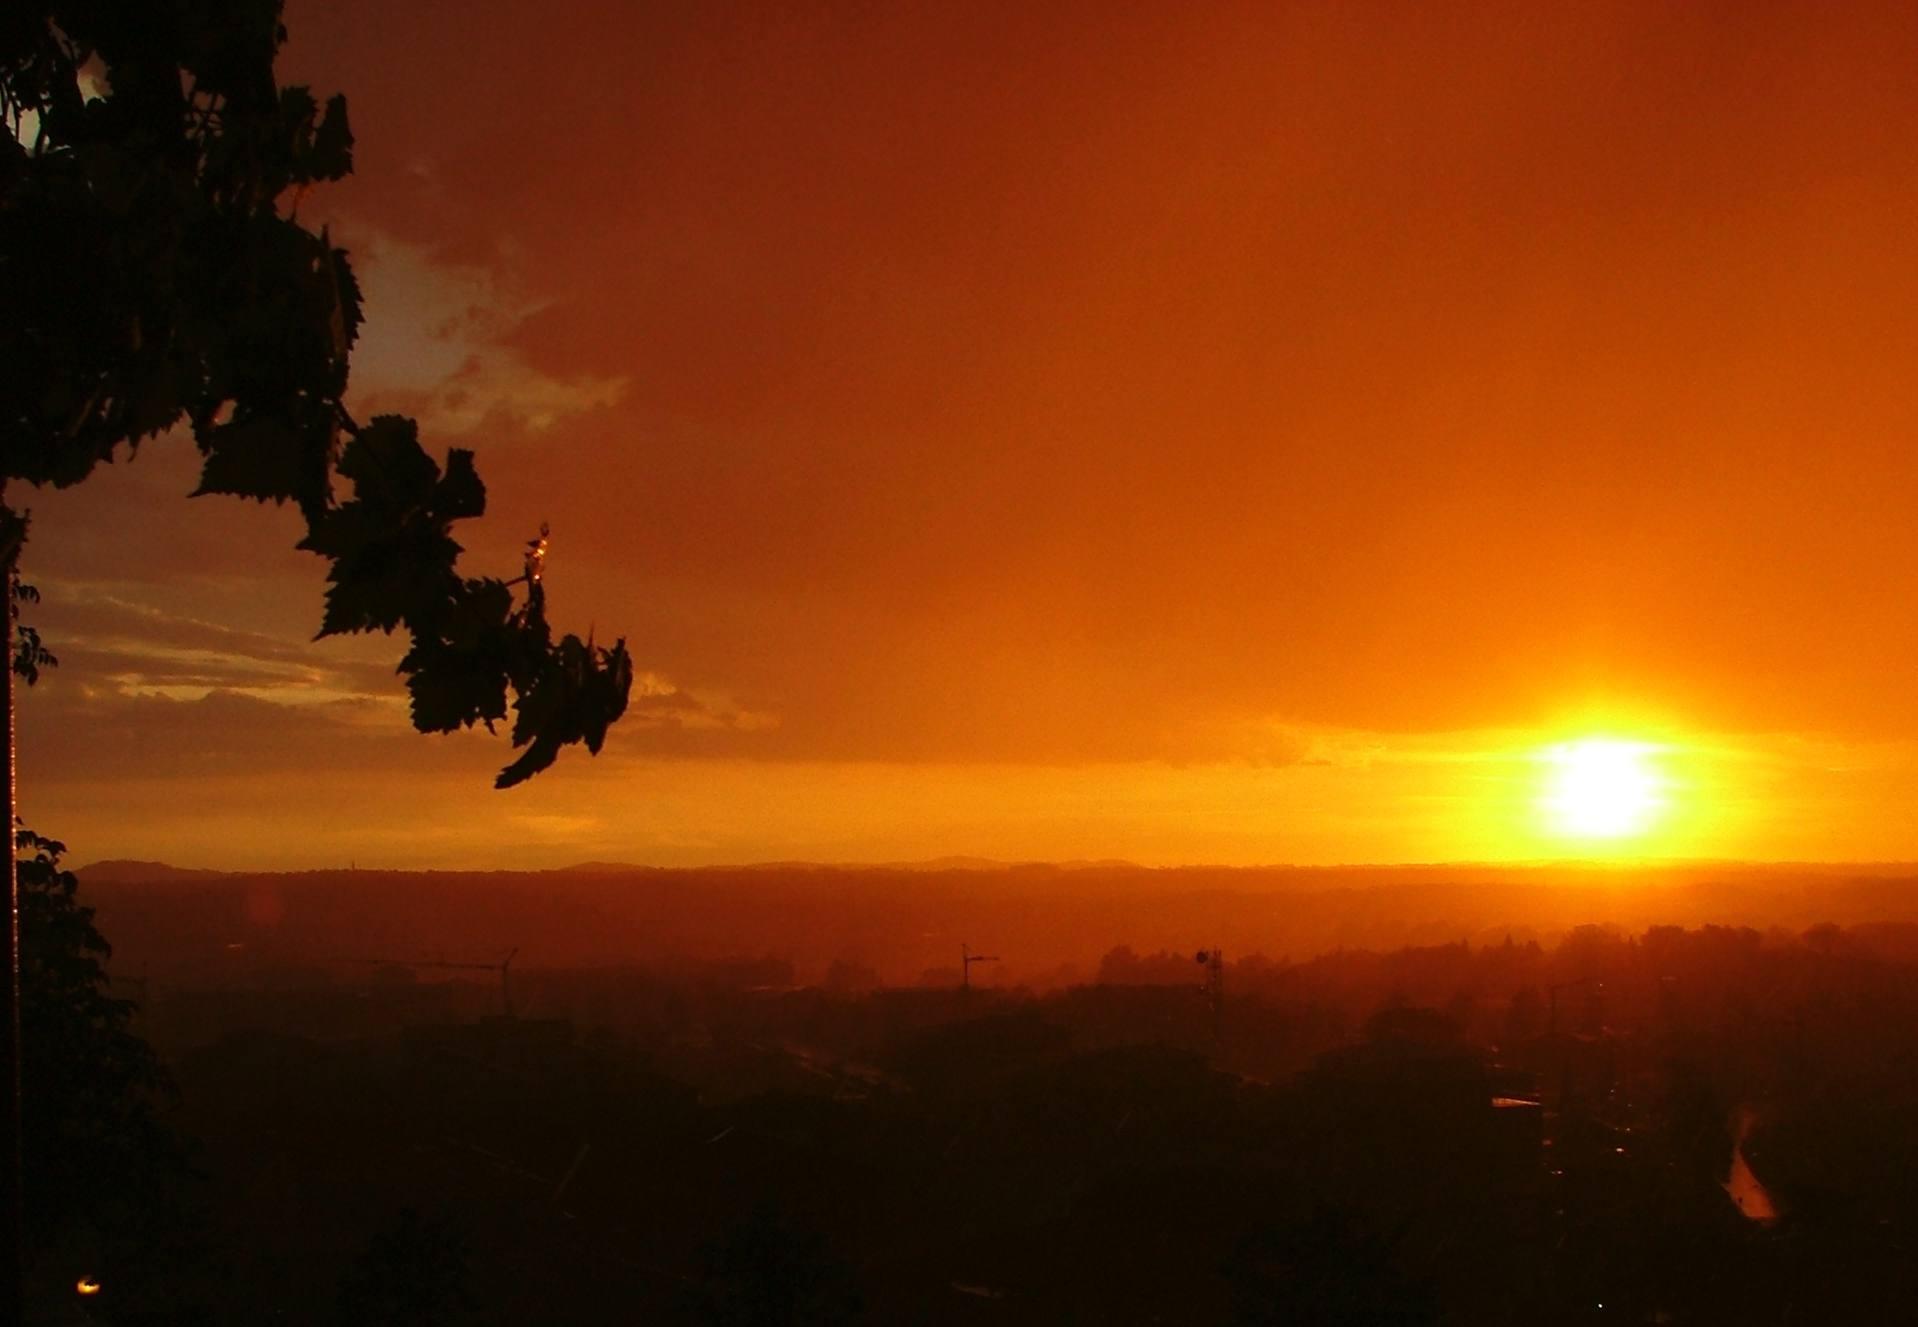 Mars sunset by cougarcat on deviantart - Mars sunset wallpaper ...